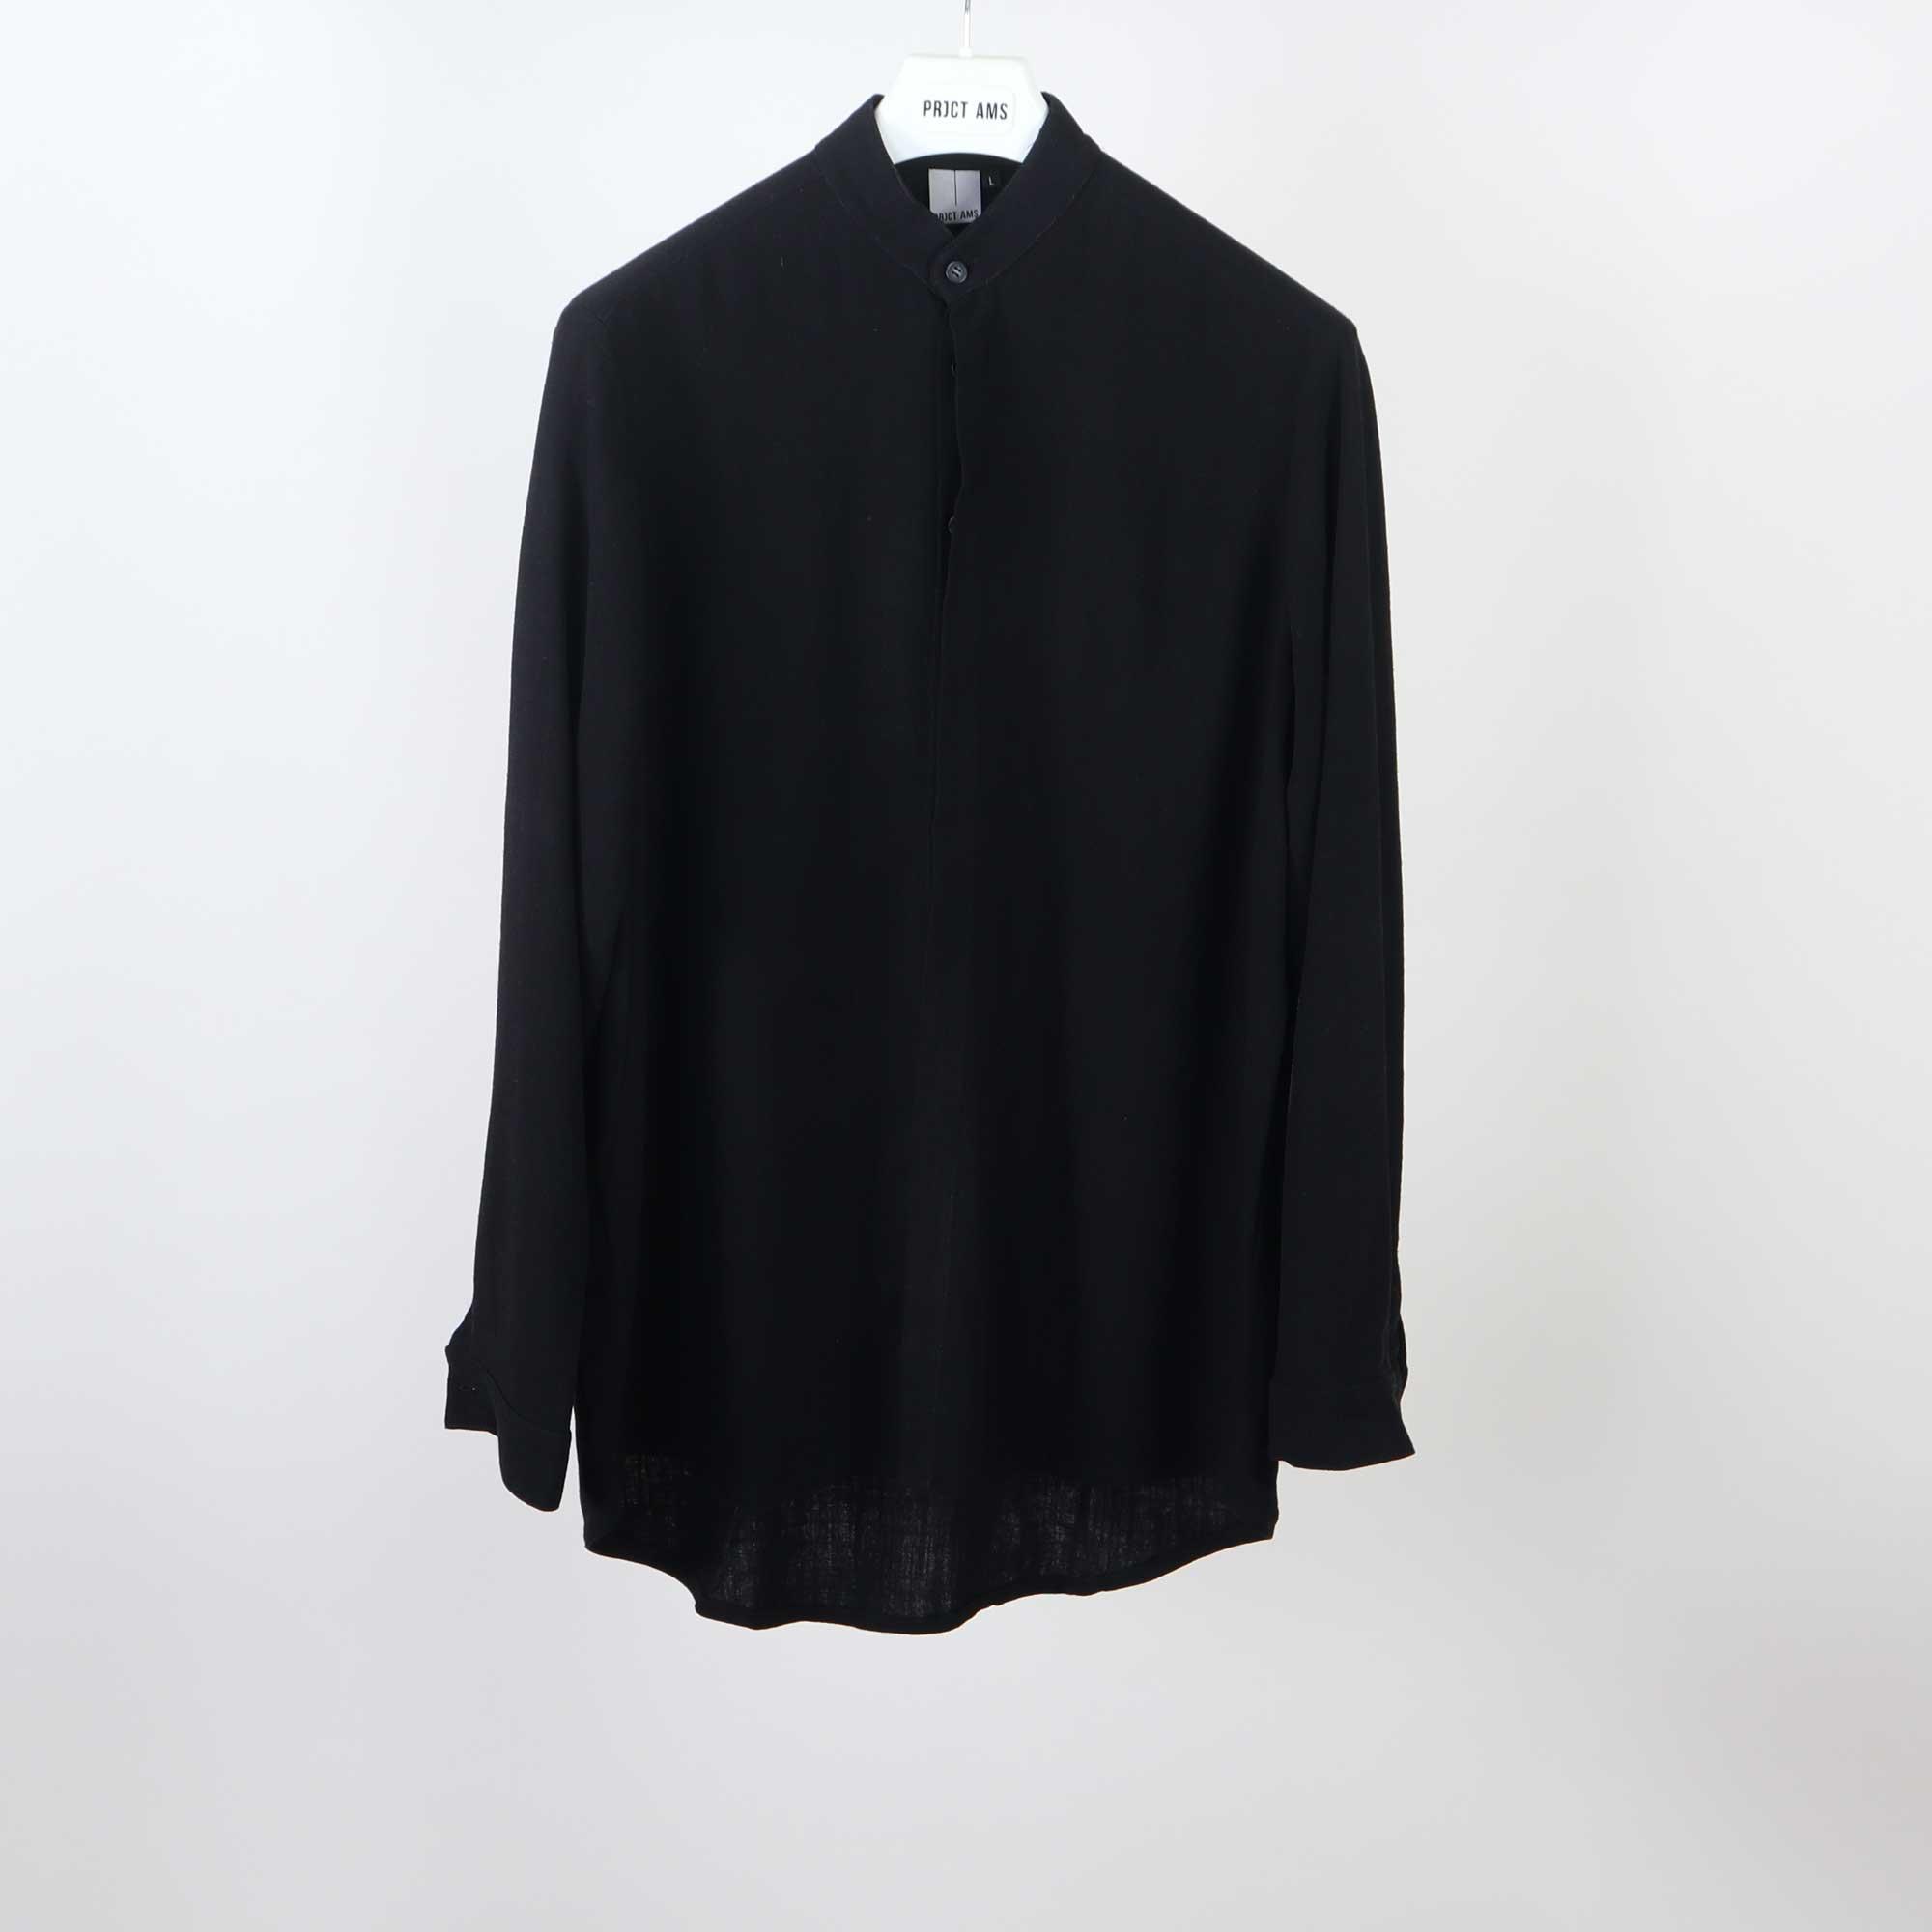 zippy-lang-zwart-5